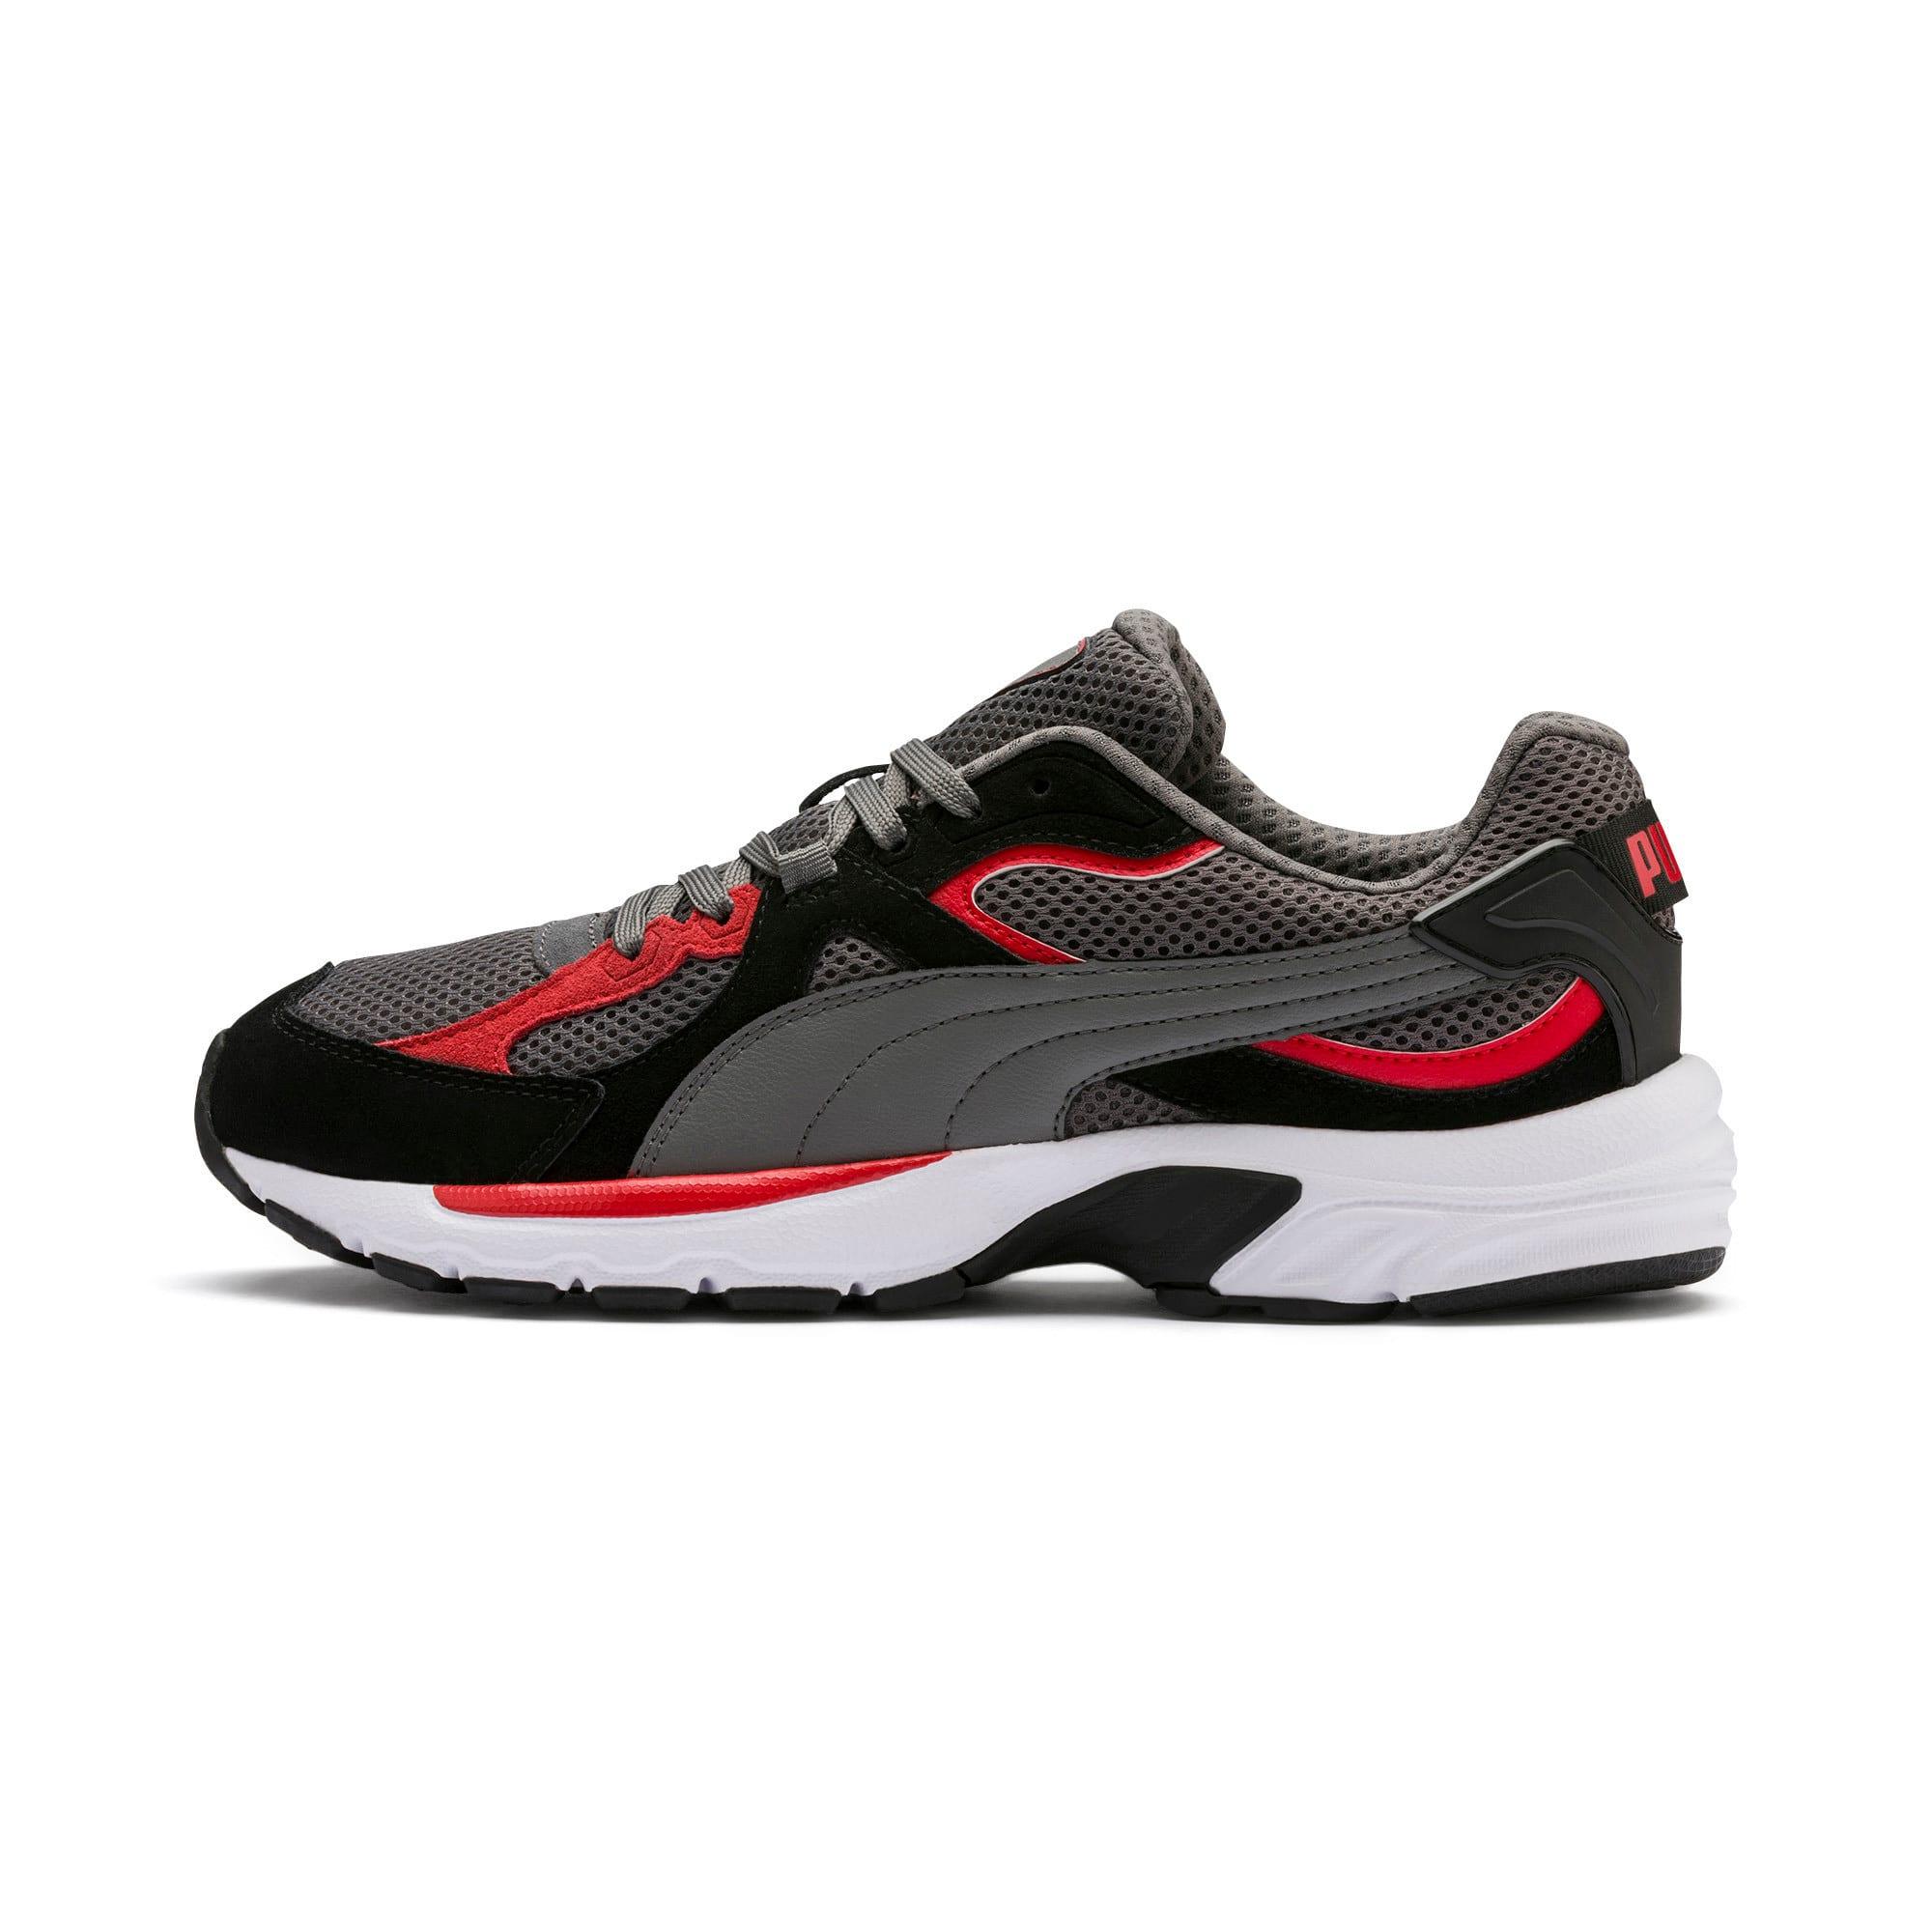 Thumbnail 1 of Axis Plus SD sneakers, CASTLEROCK-Black-Red-White, medium